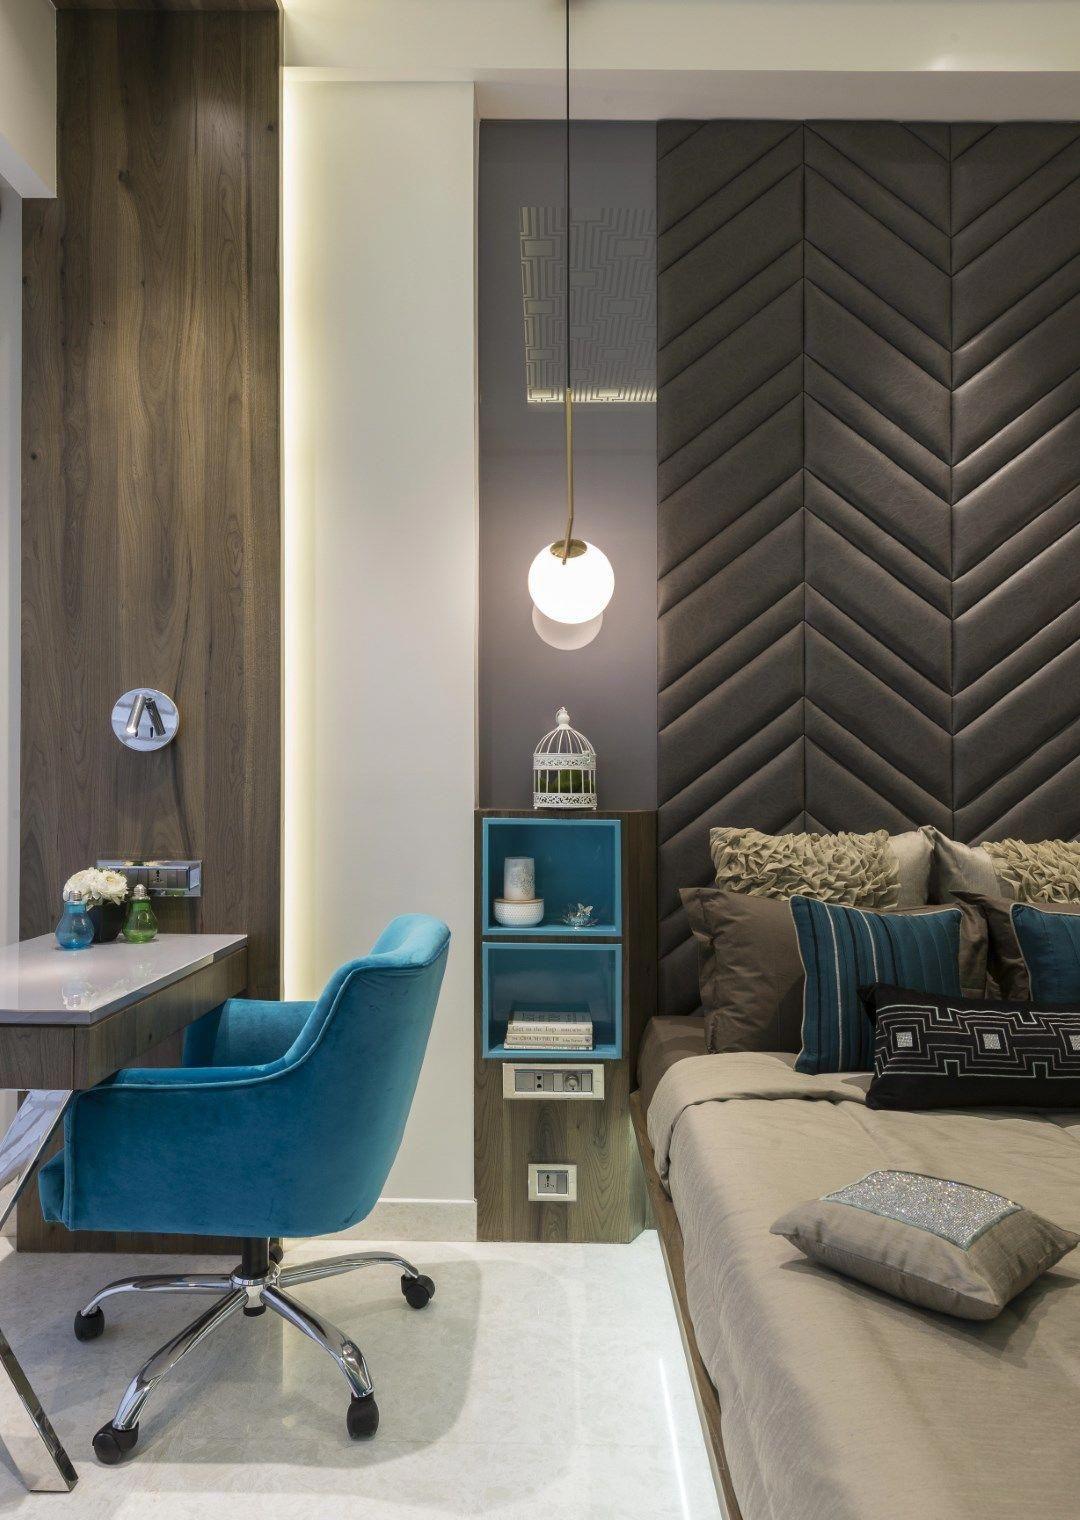 Chambre Italienne Meubles Et Lits De Luxe Decorrustiqueglam Interior Design Living Room Home Decor Styles Interior Design